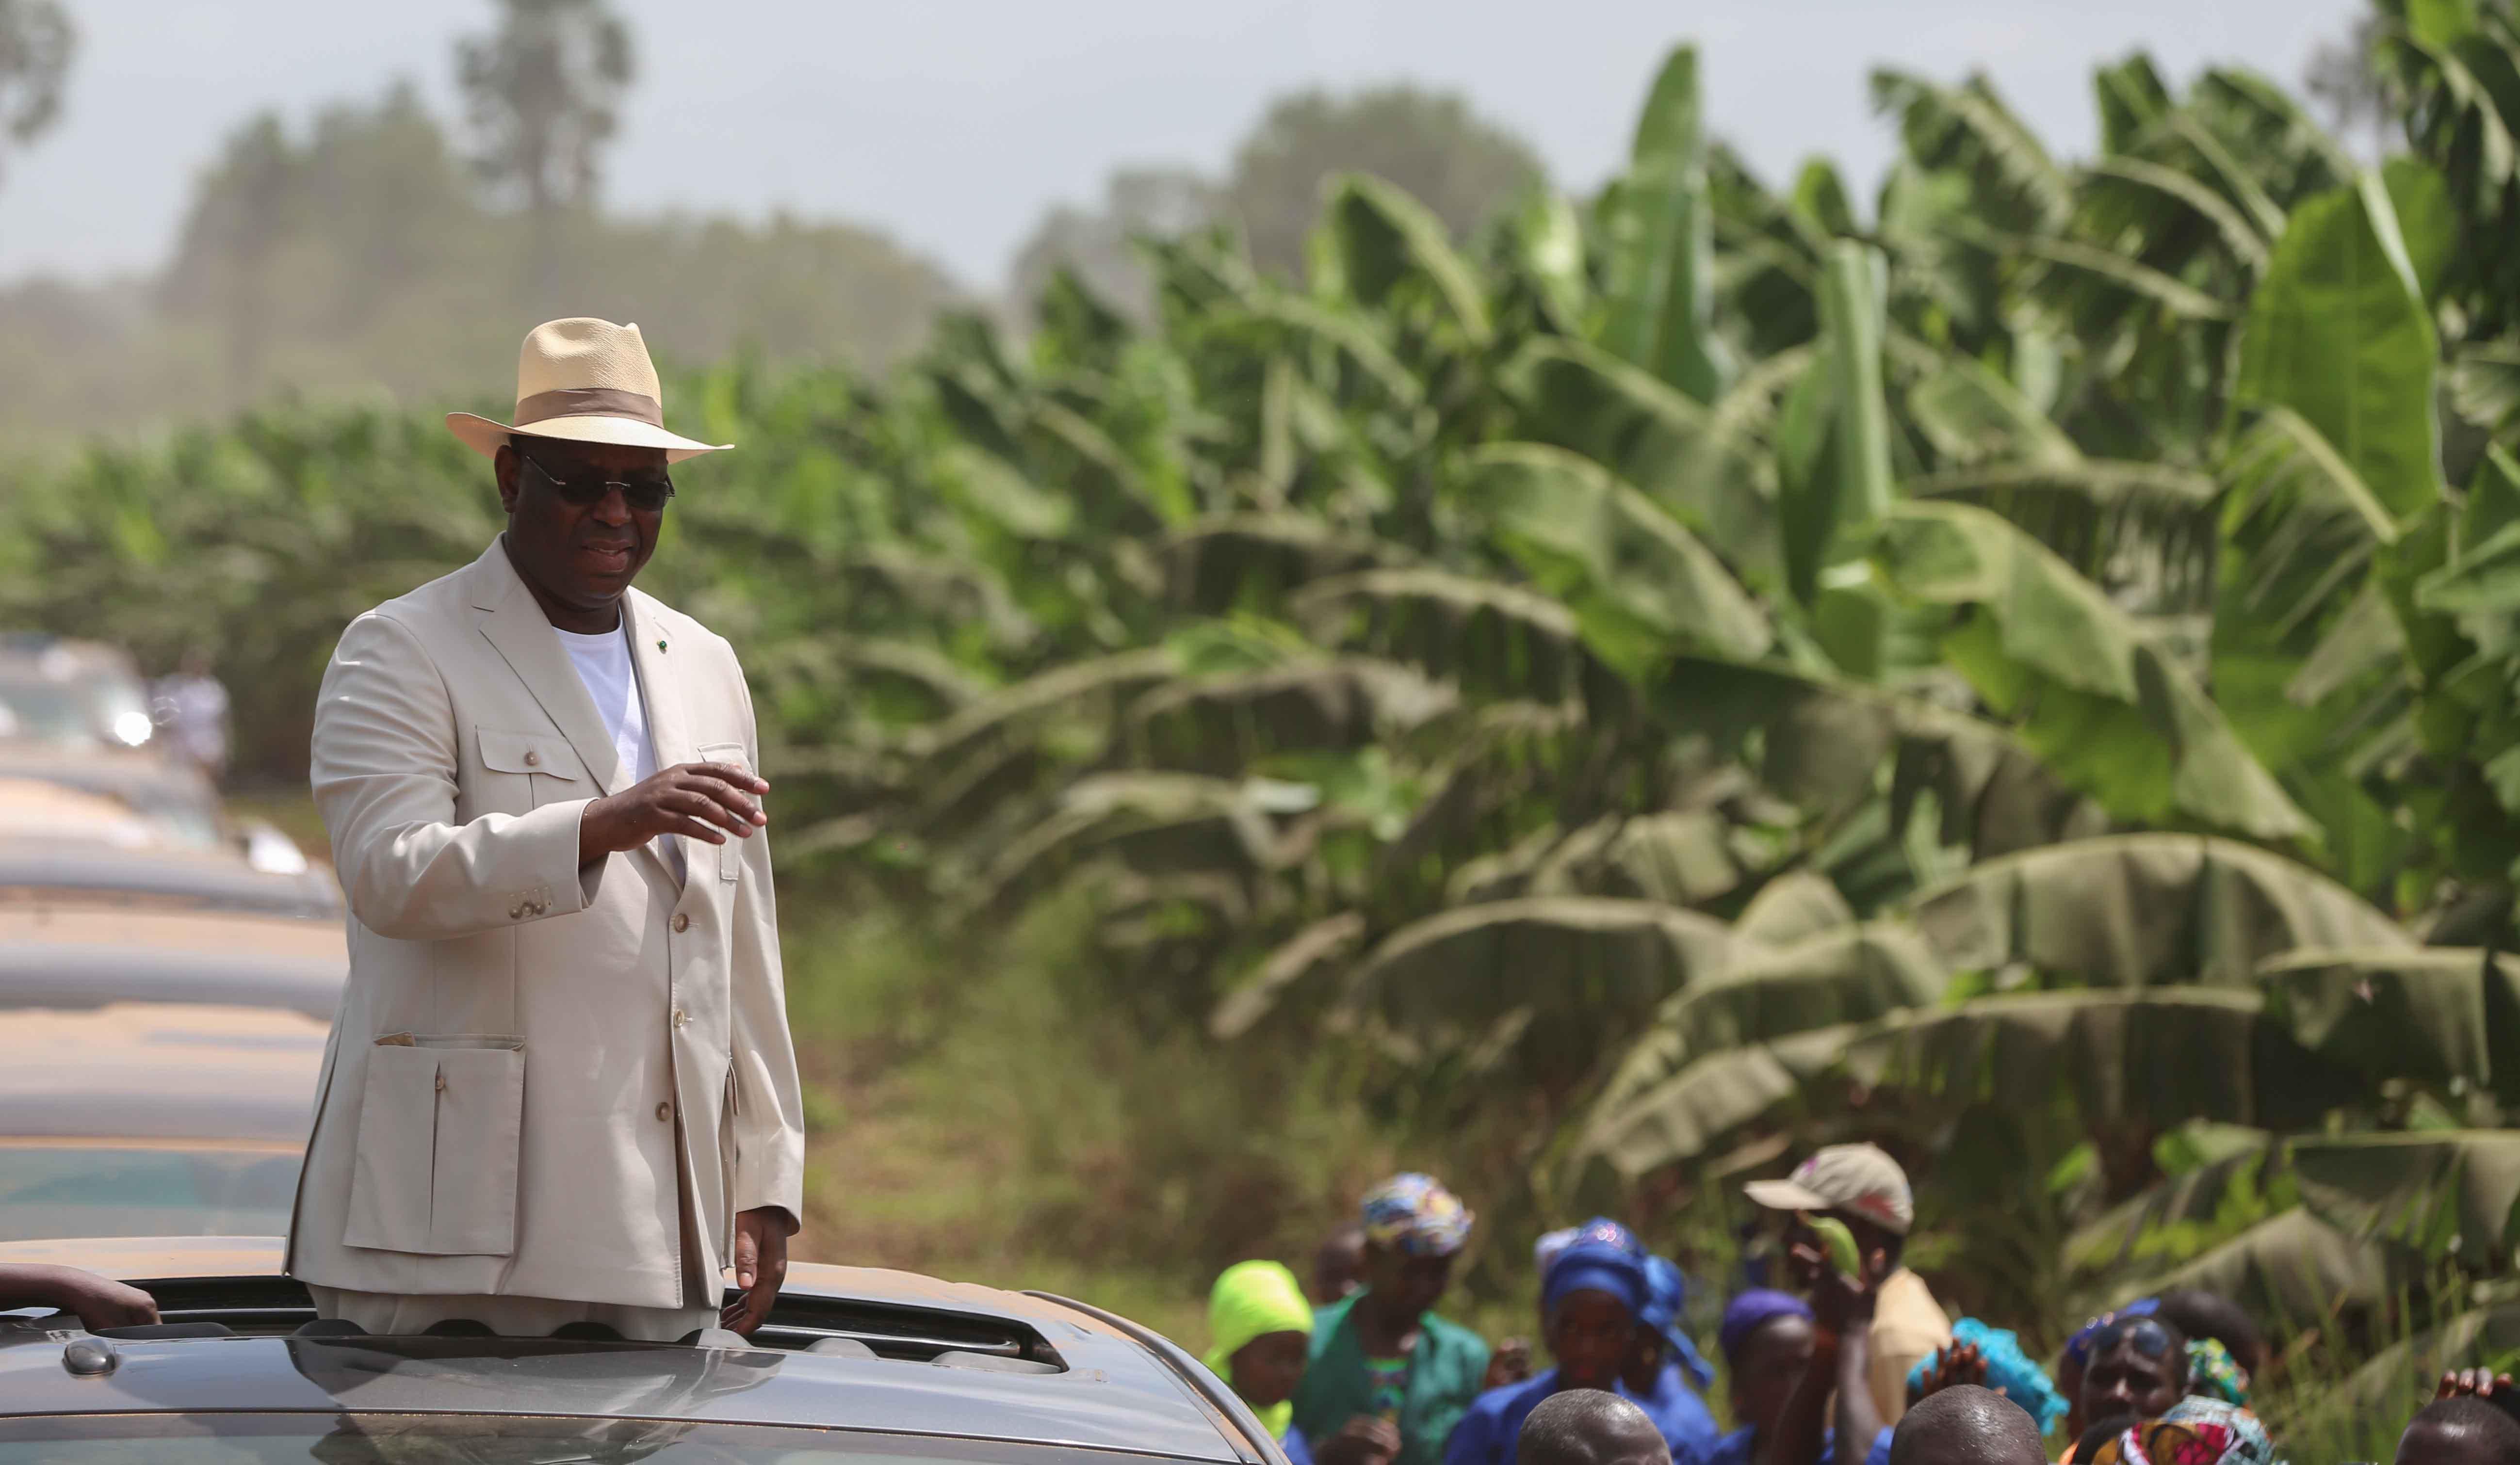 Photos : Visite du Président Macky Sall dans les plantations de banane (200 ha) de Mamadou Sall et de CORPROBAT á Laboya (Tambacounda)